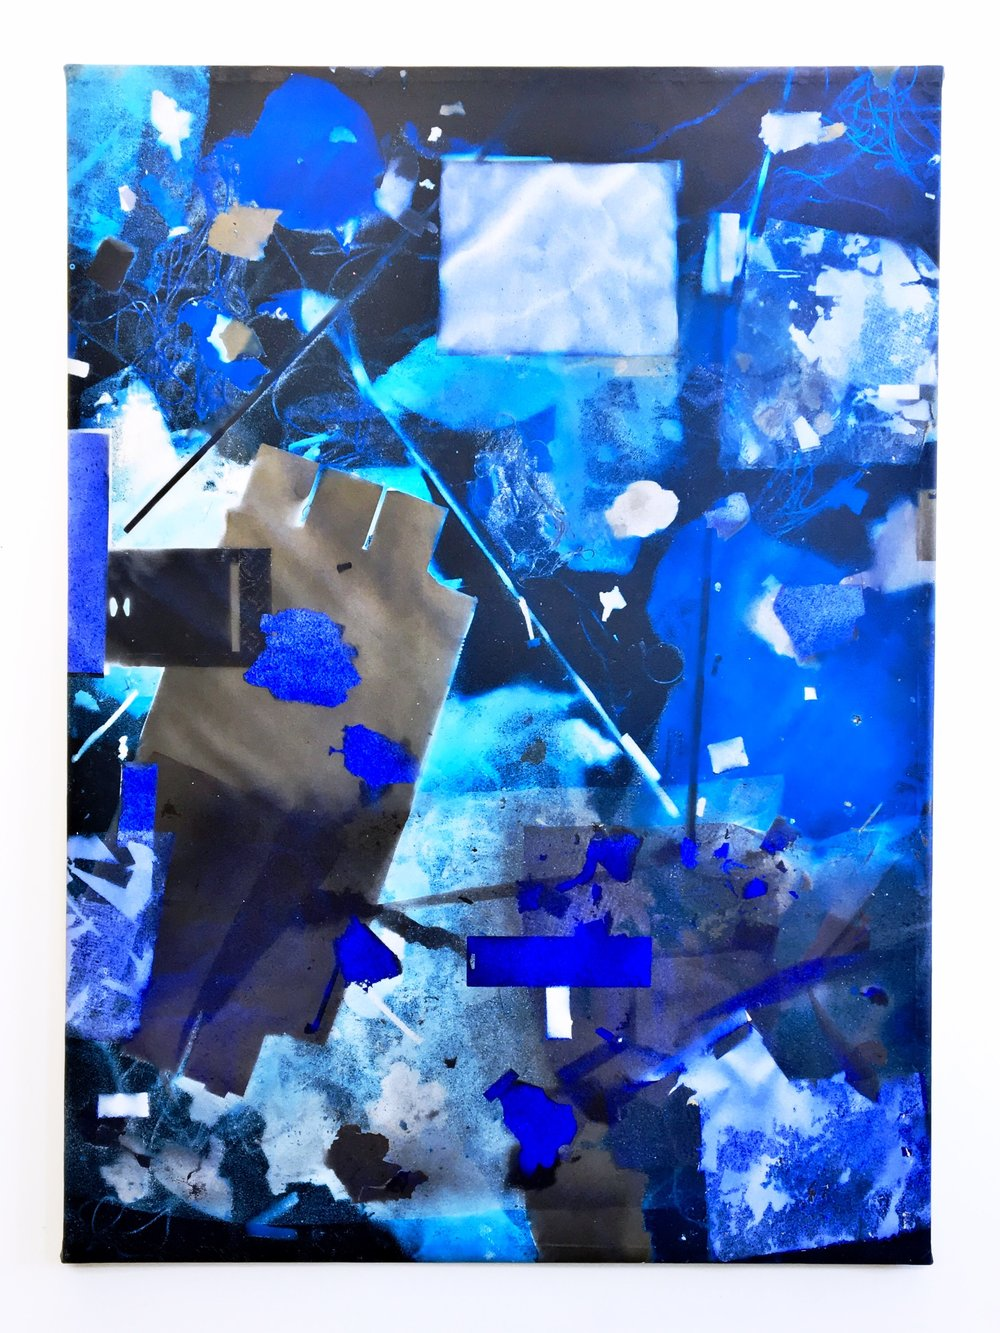 IAIN MUIRHEAD   1725  , 2017. Airborne pigment, acrylic binder, 10oz cotton duck canvas, white titanium gesso, milled pine, 3mm staples, #8 screws. 93.5 x 68 inches.